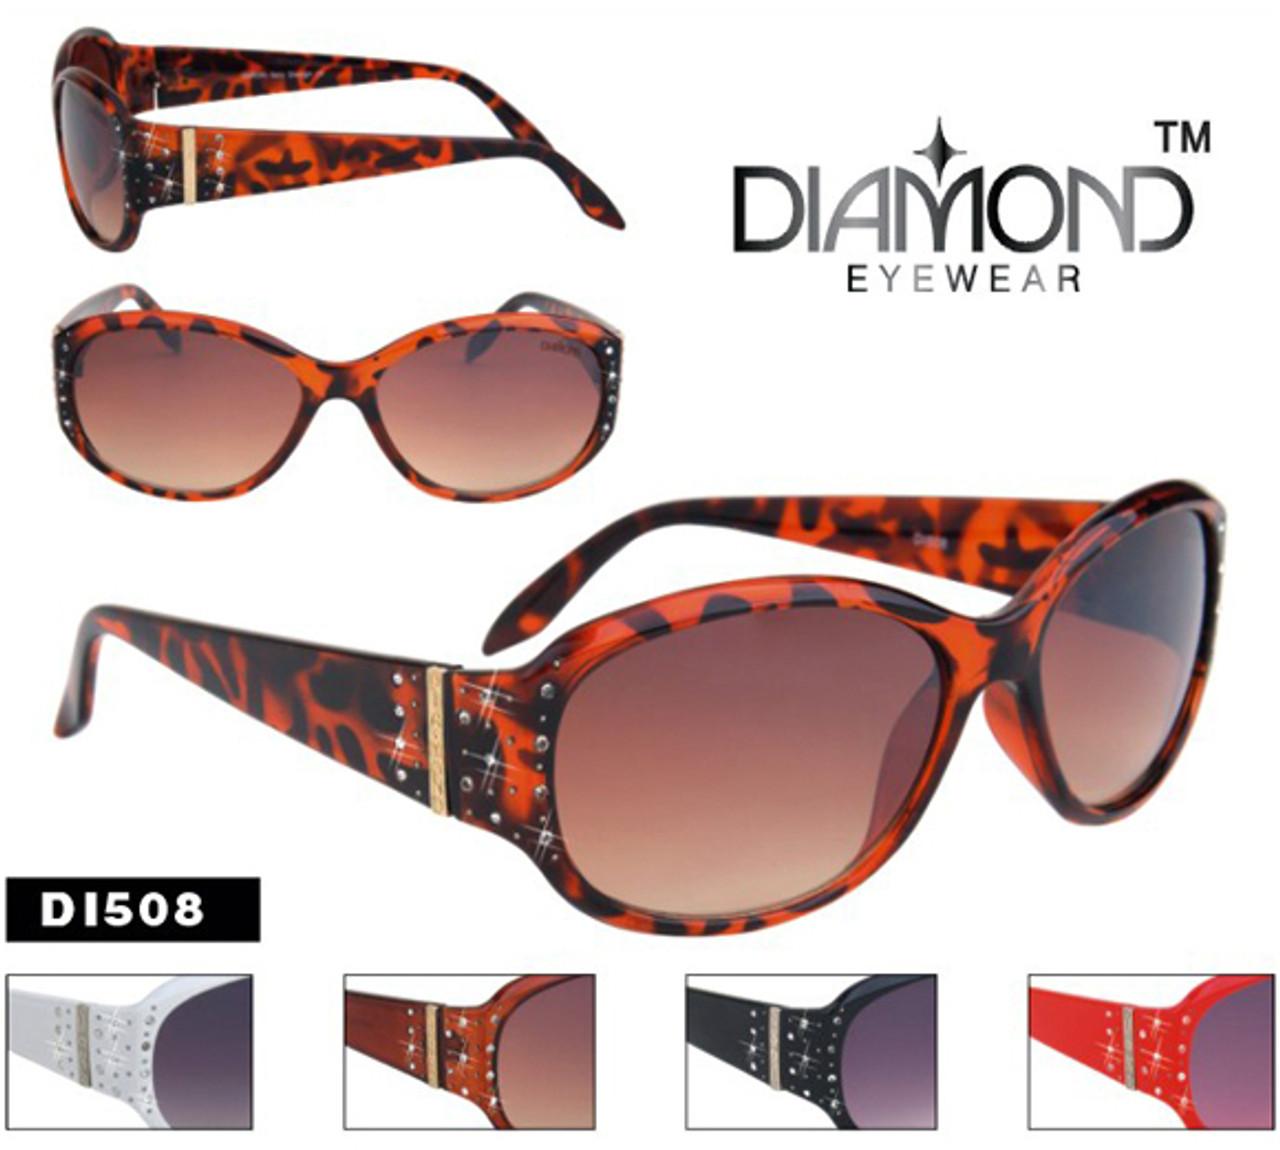 Wholesale Women's Diamond Eyewear DI508